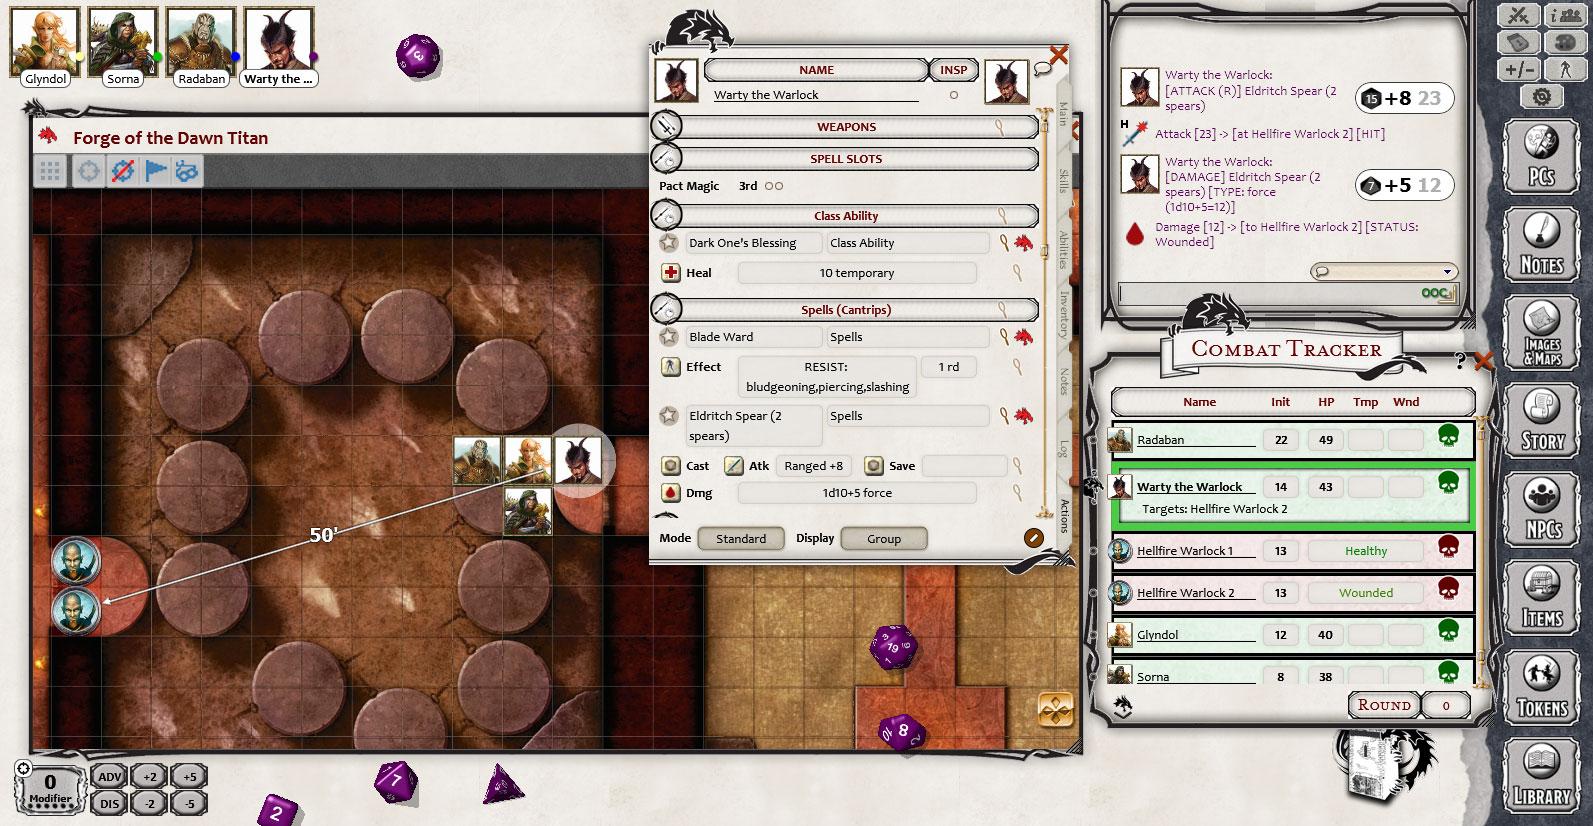 Fantasy Grounds - D&D Lair Assault: Forge of the Dawn Titan screenshot